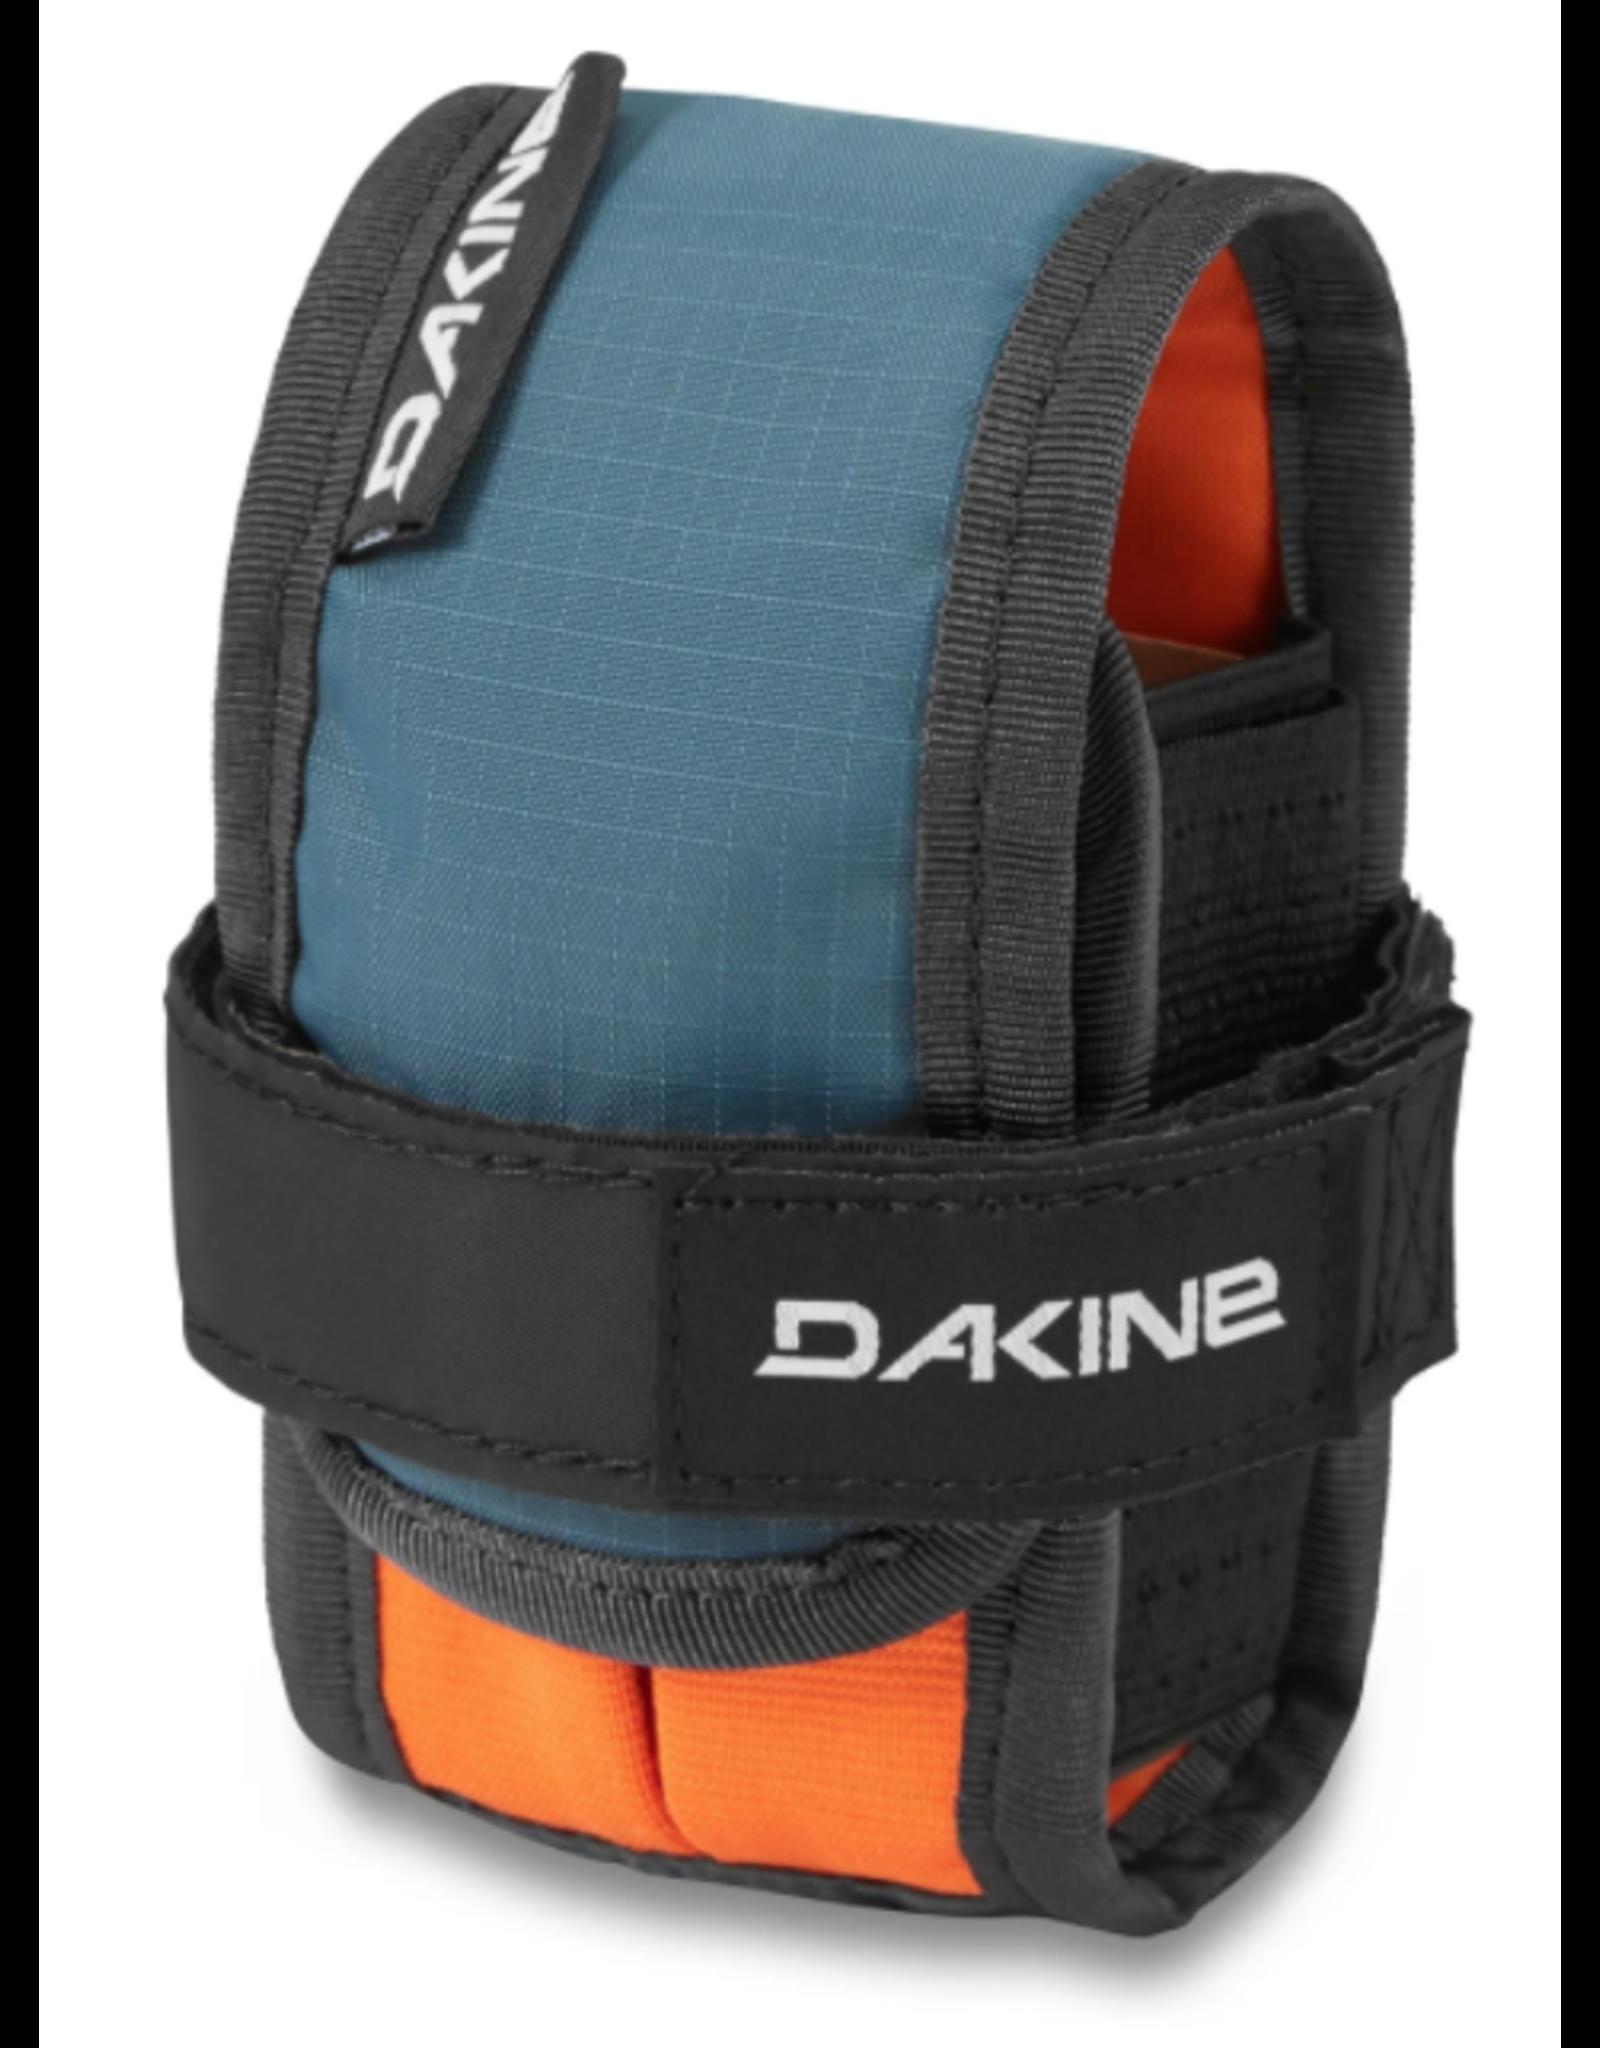 DAKINE HOT LAPS GRIPPER: SLATE BLUE